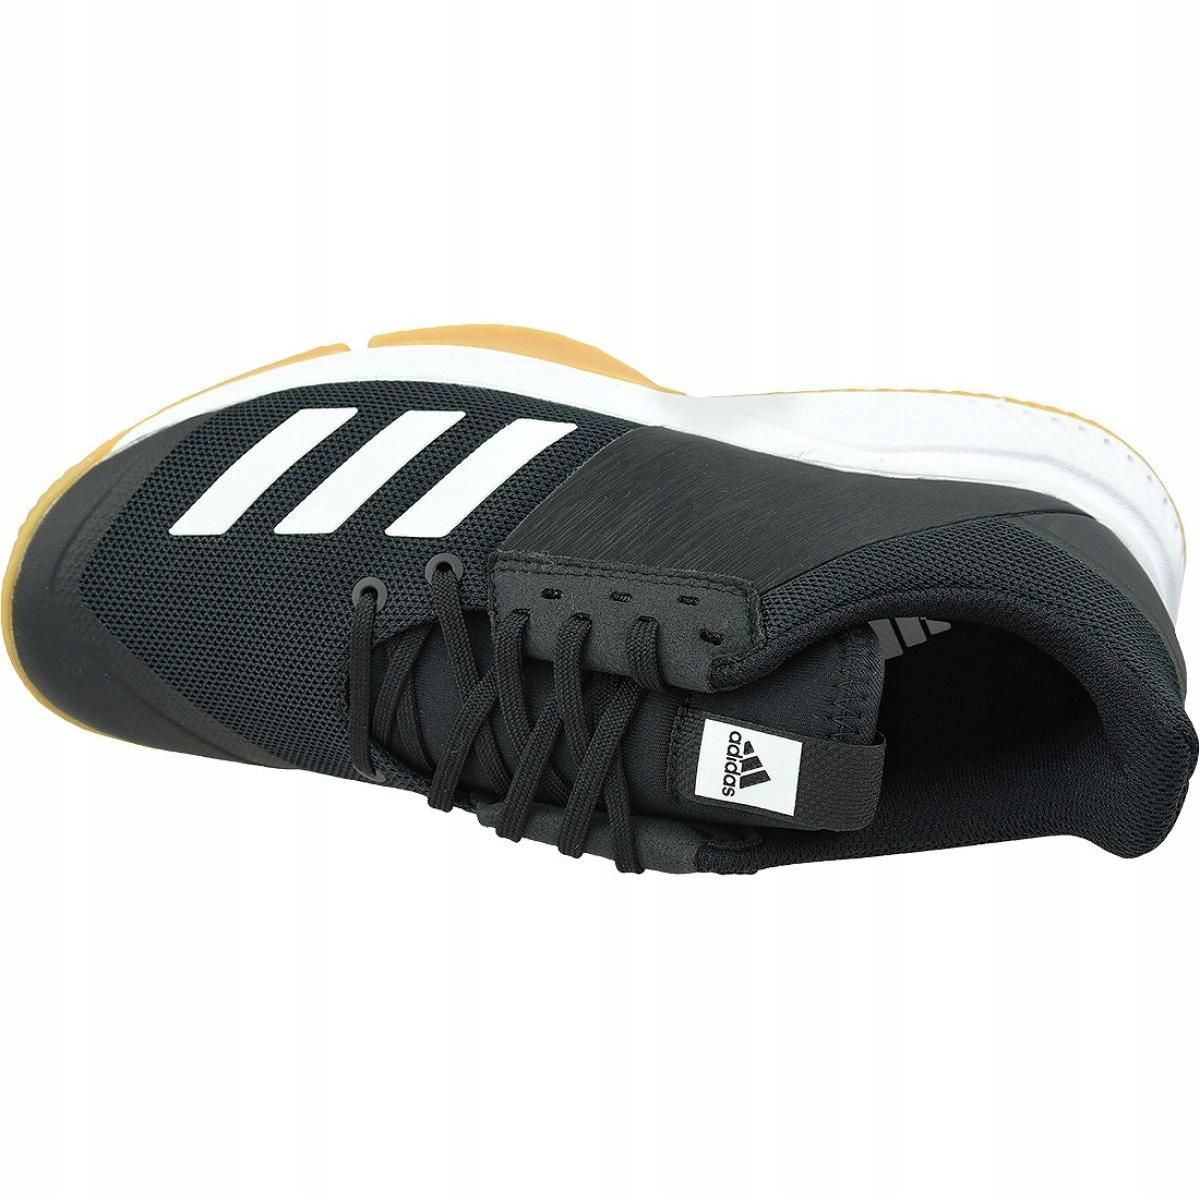 Cuadrante inferencia Noble  Adidas Crazyflight Team M D97701 volleyball shoes black black | eBay